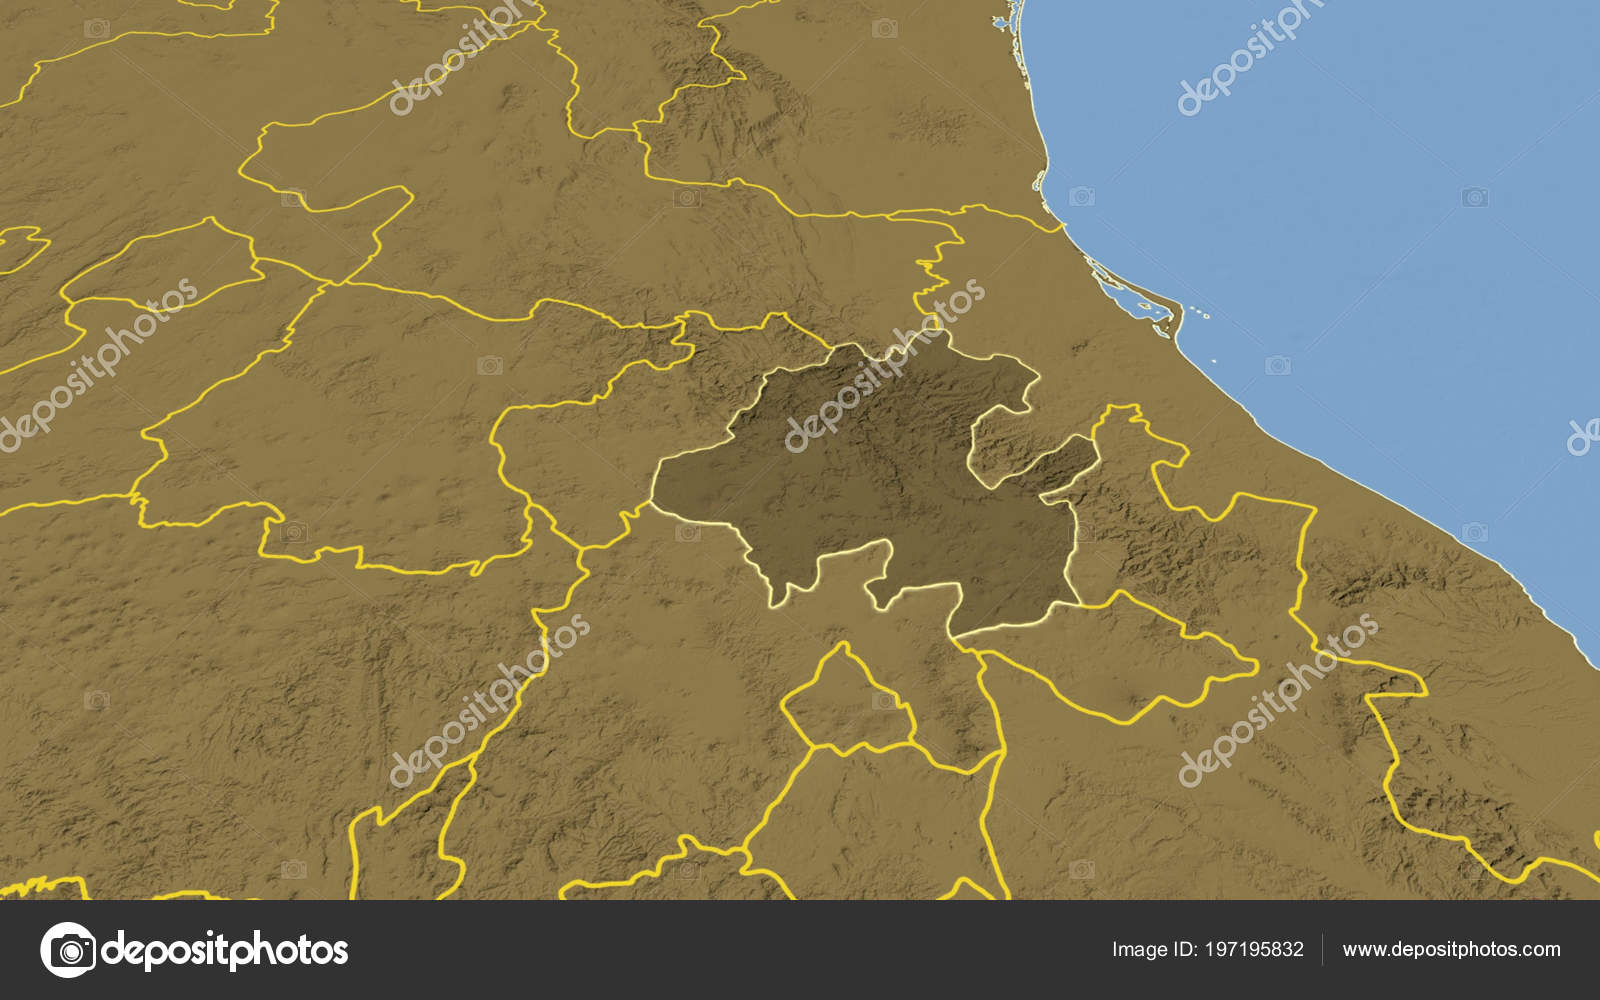 Hidalgo Region Mexico Outlined Bilevel Elevation Map — Stock Photo ...